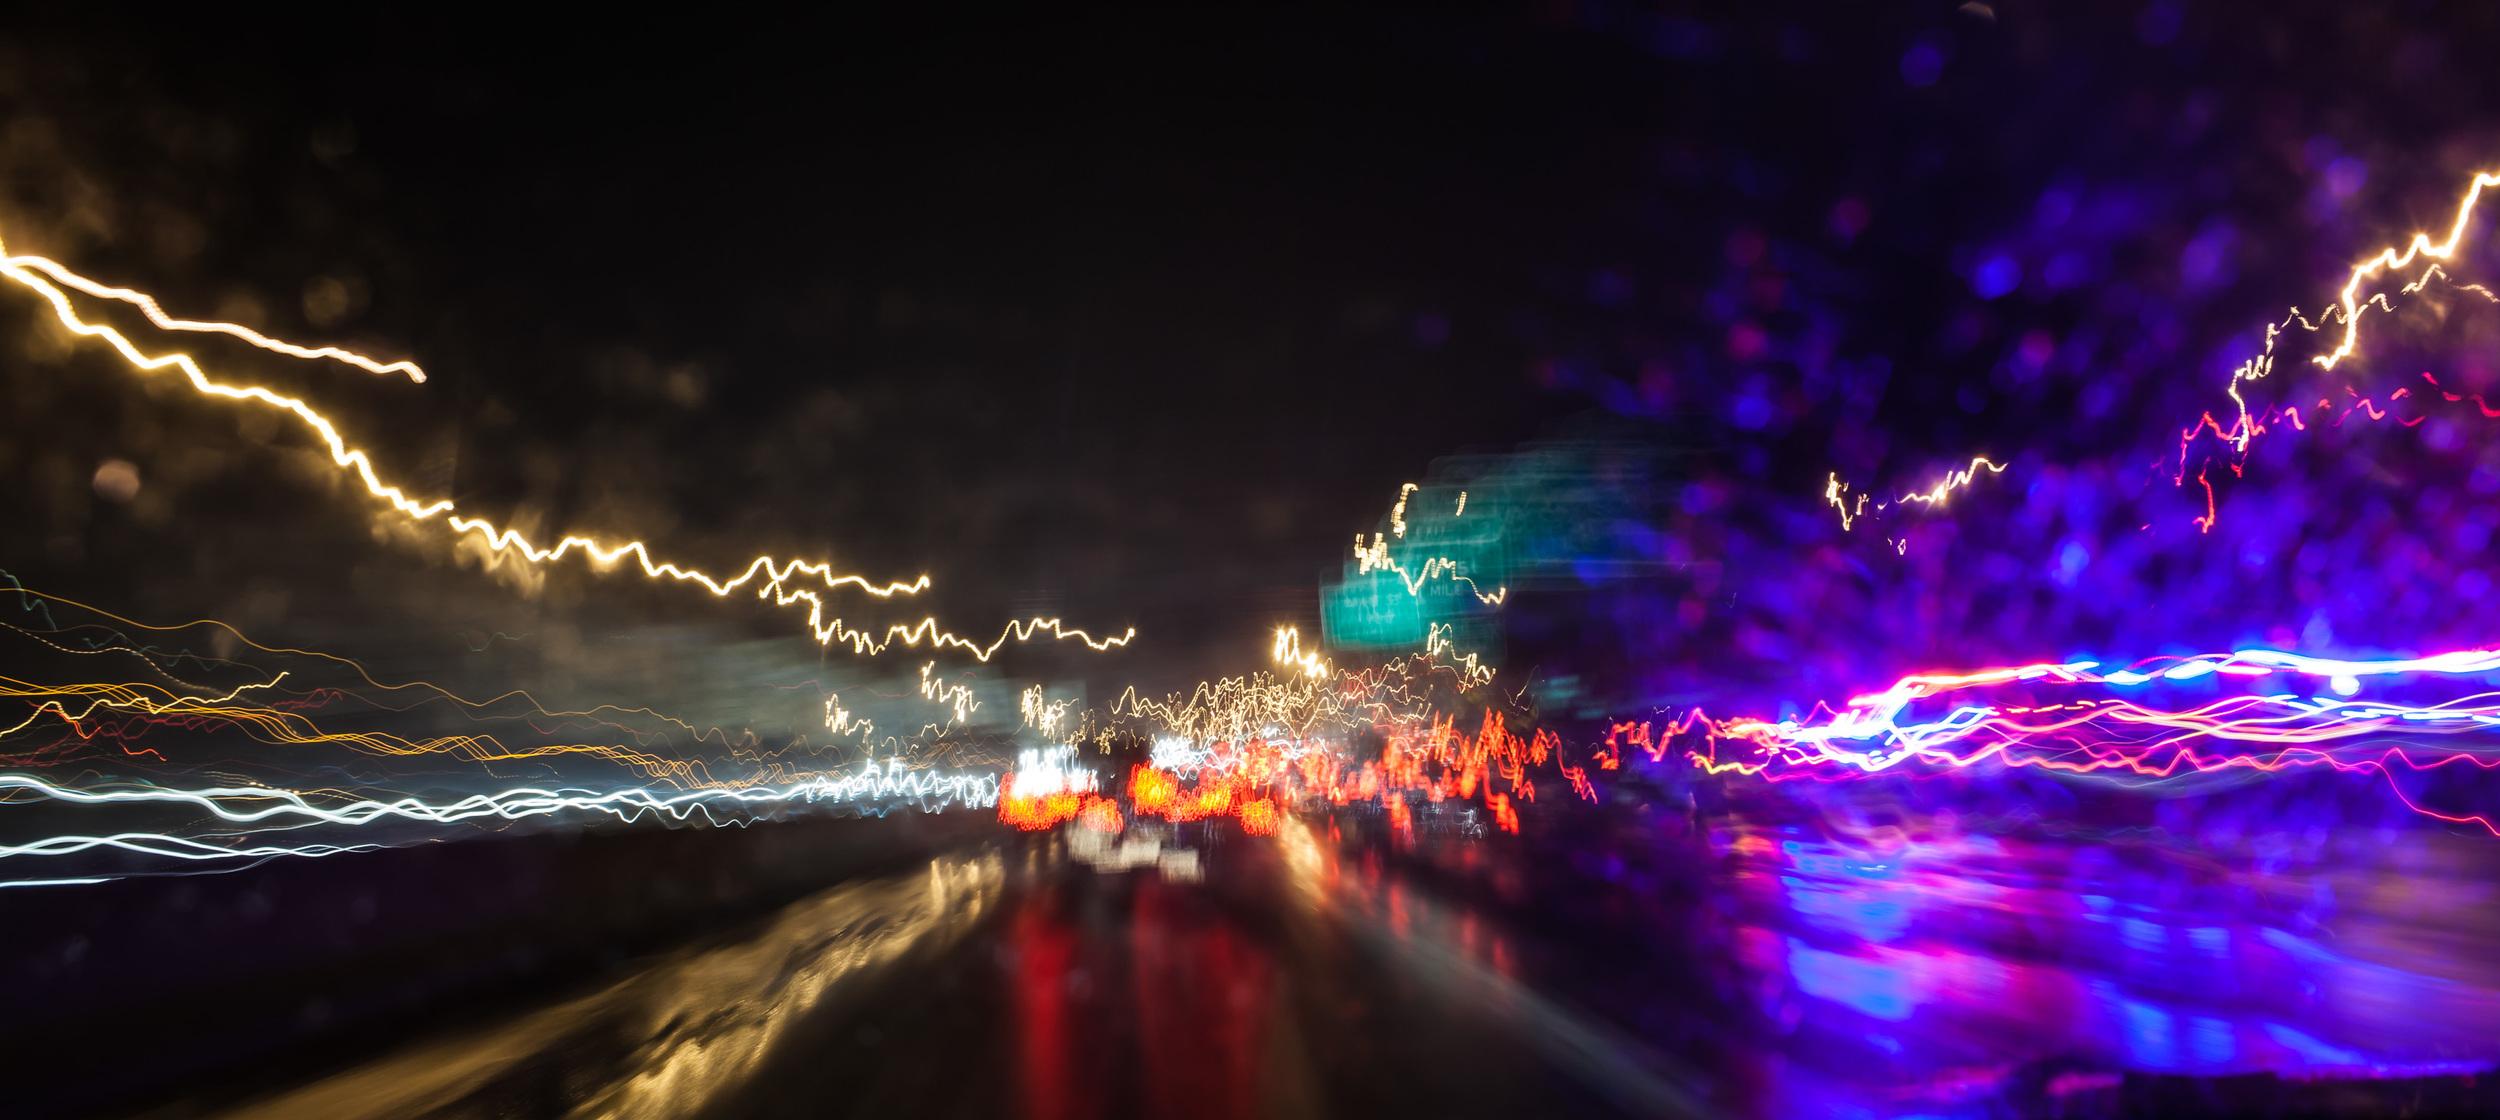 Traffic and rain